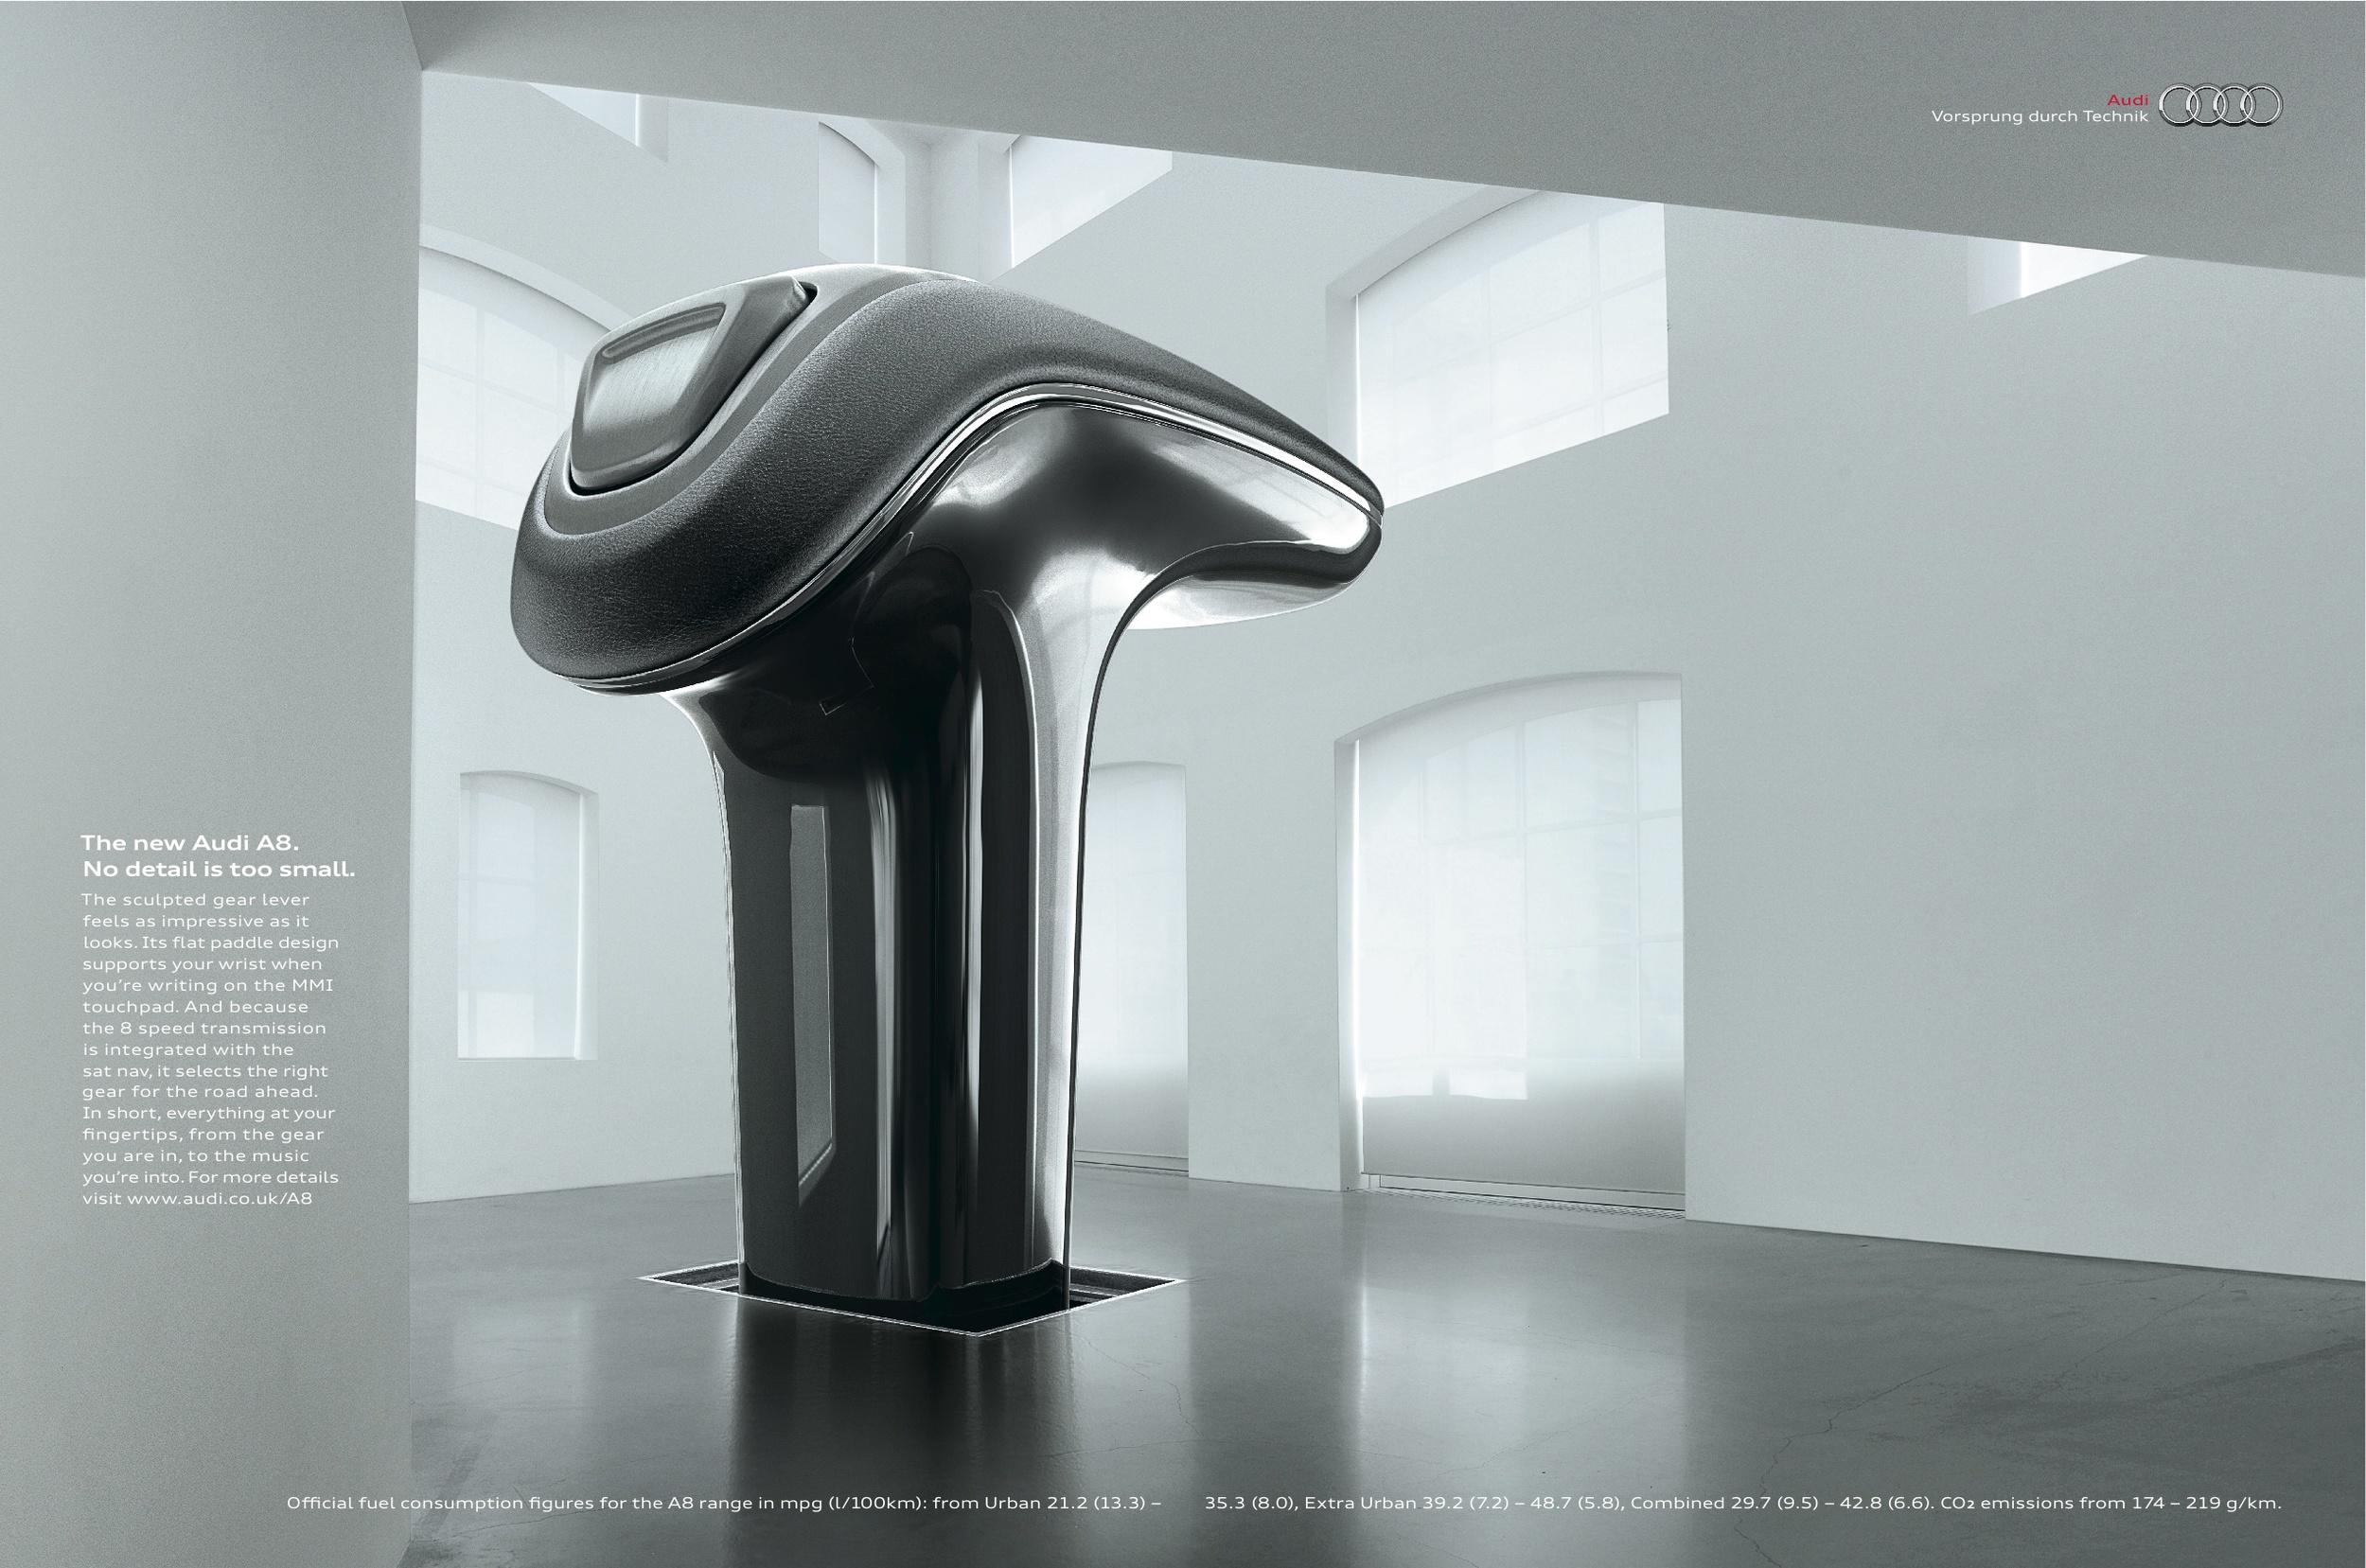 AUDI A8 Gearstick.jpg